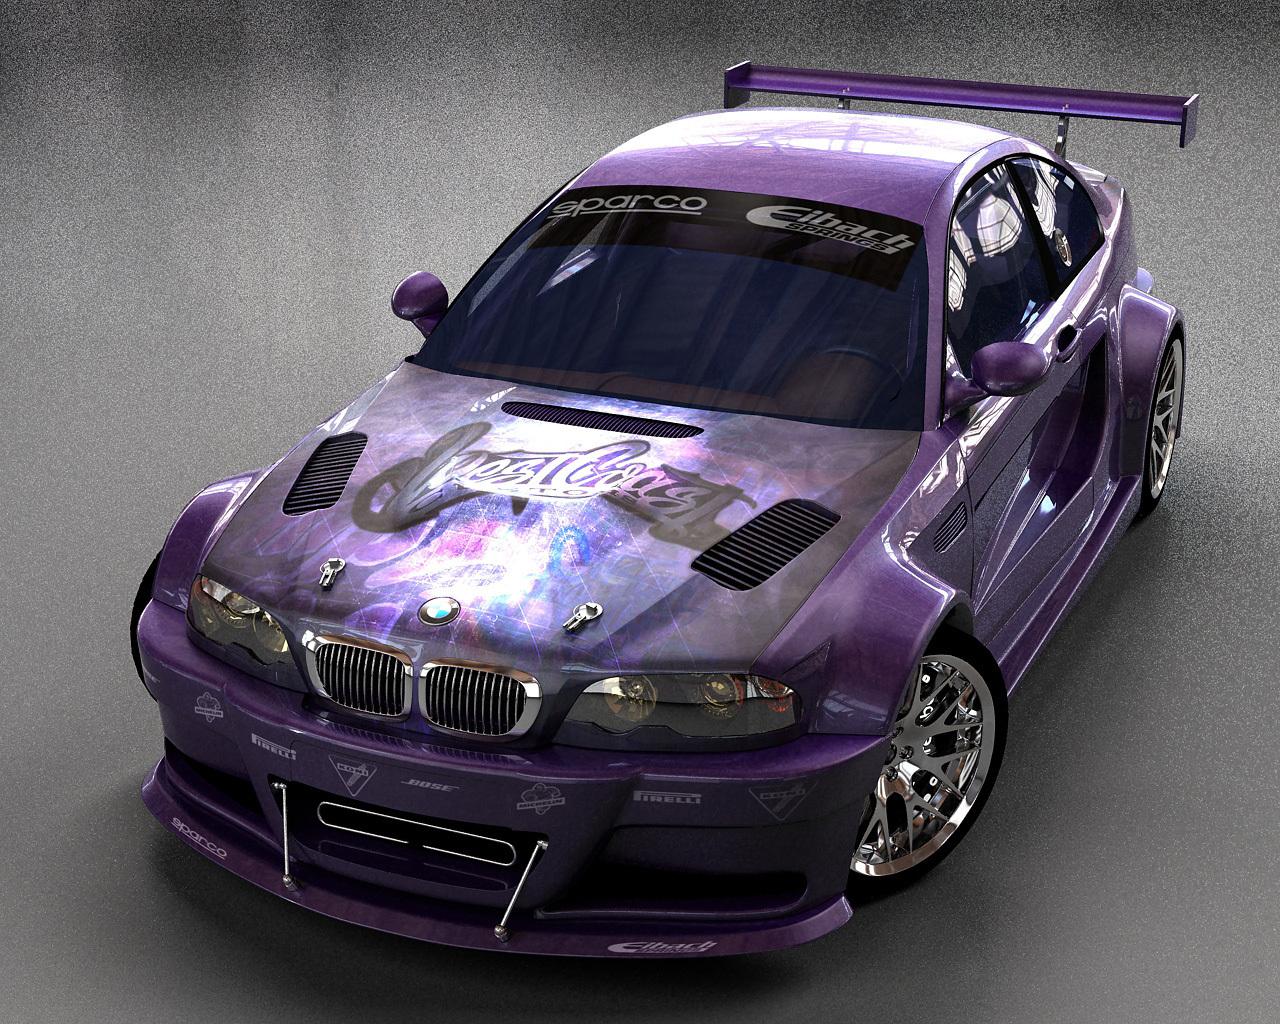 BMW TUNING - BMW Wallpaper (13479585) - Fanpop